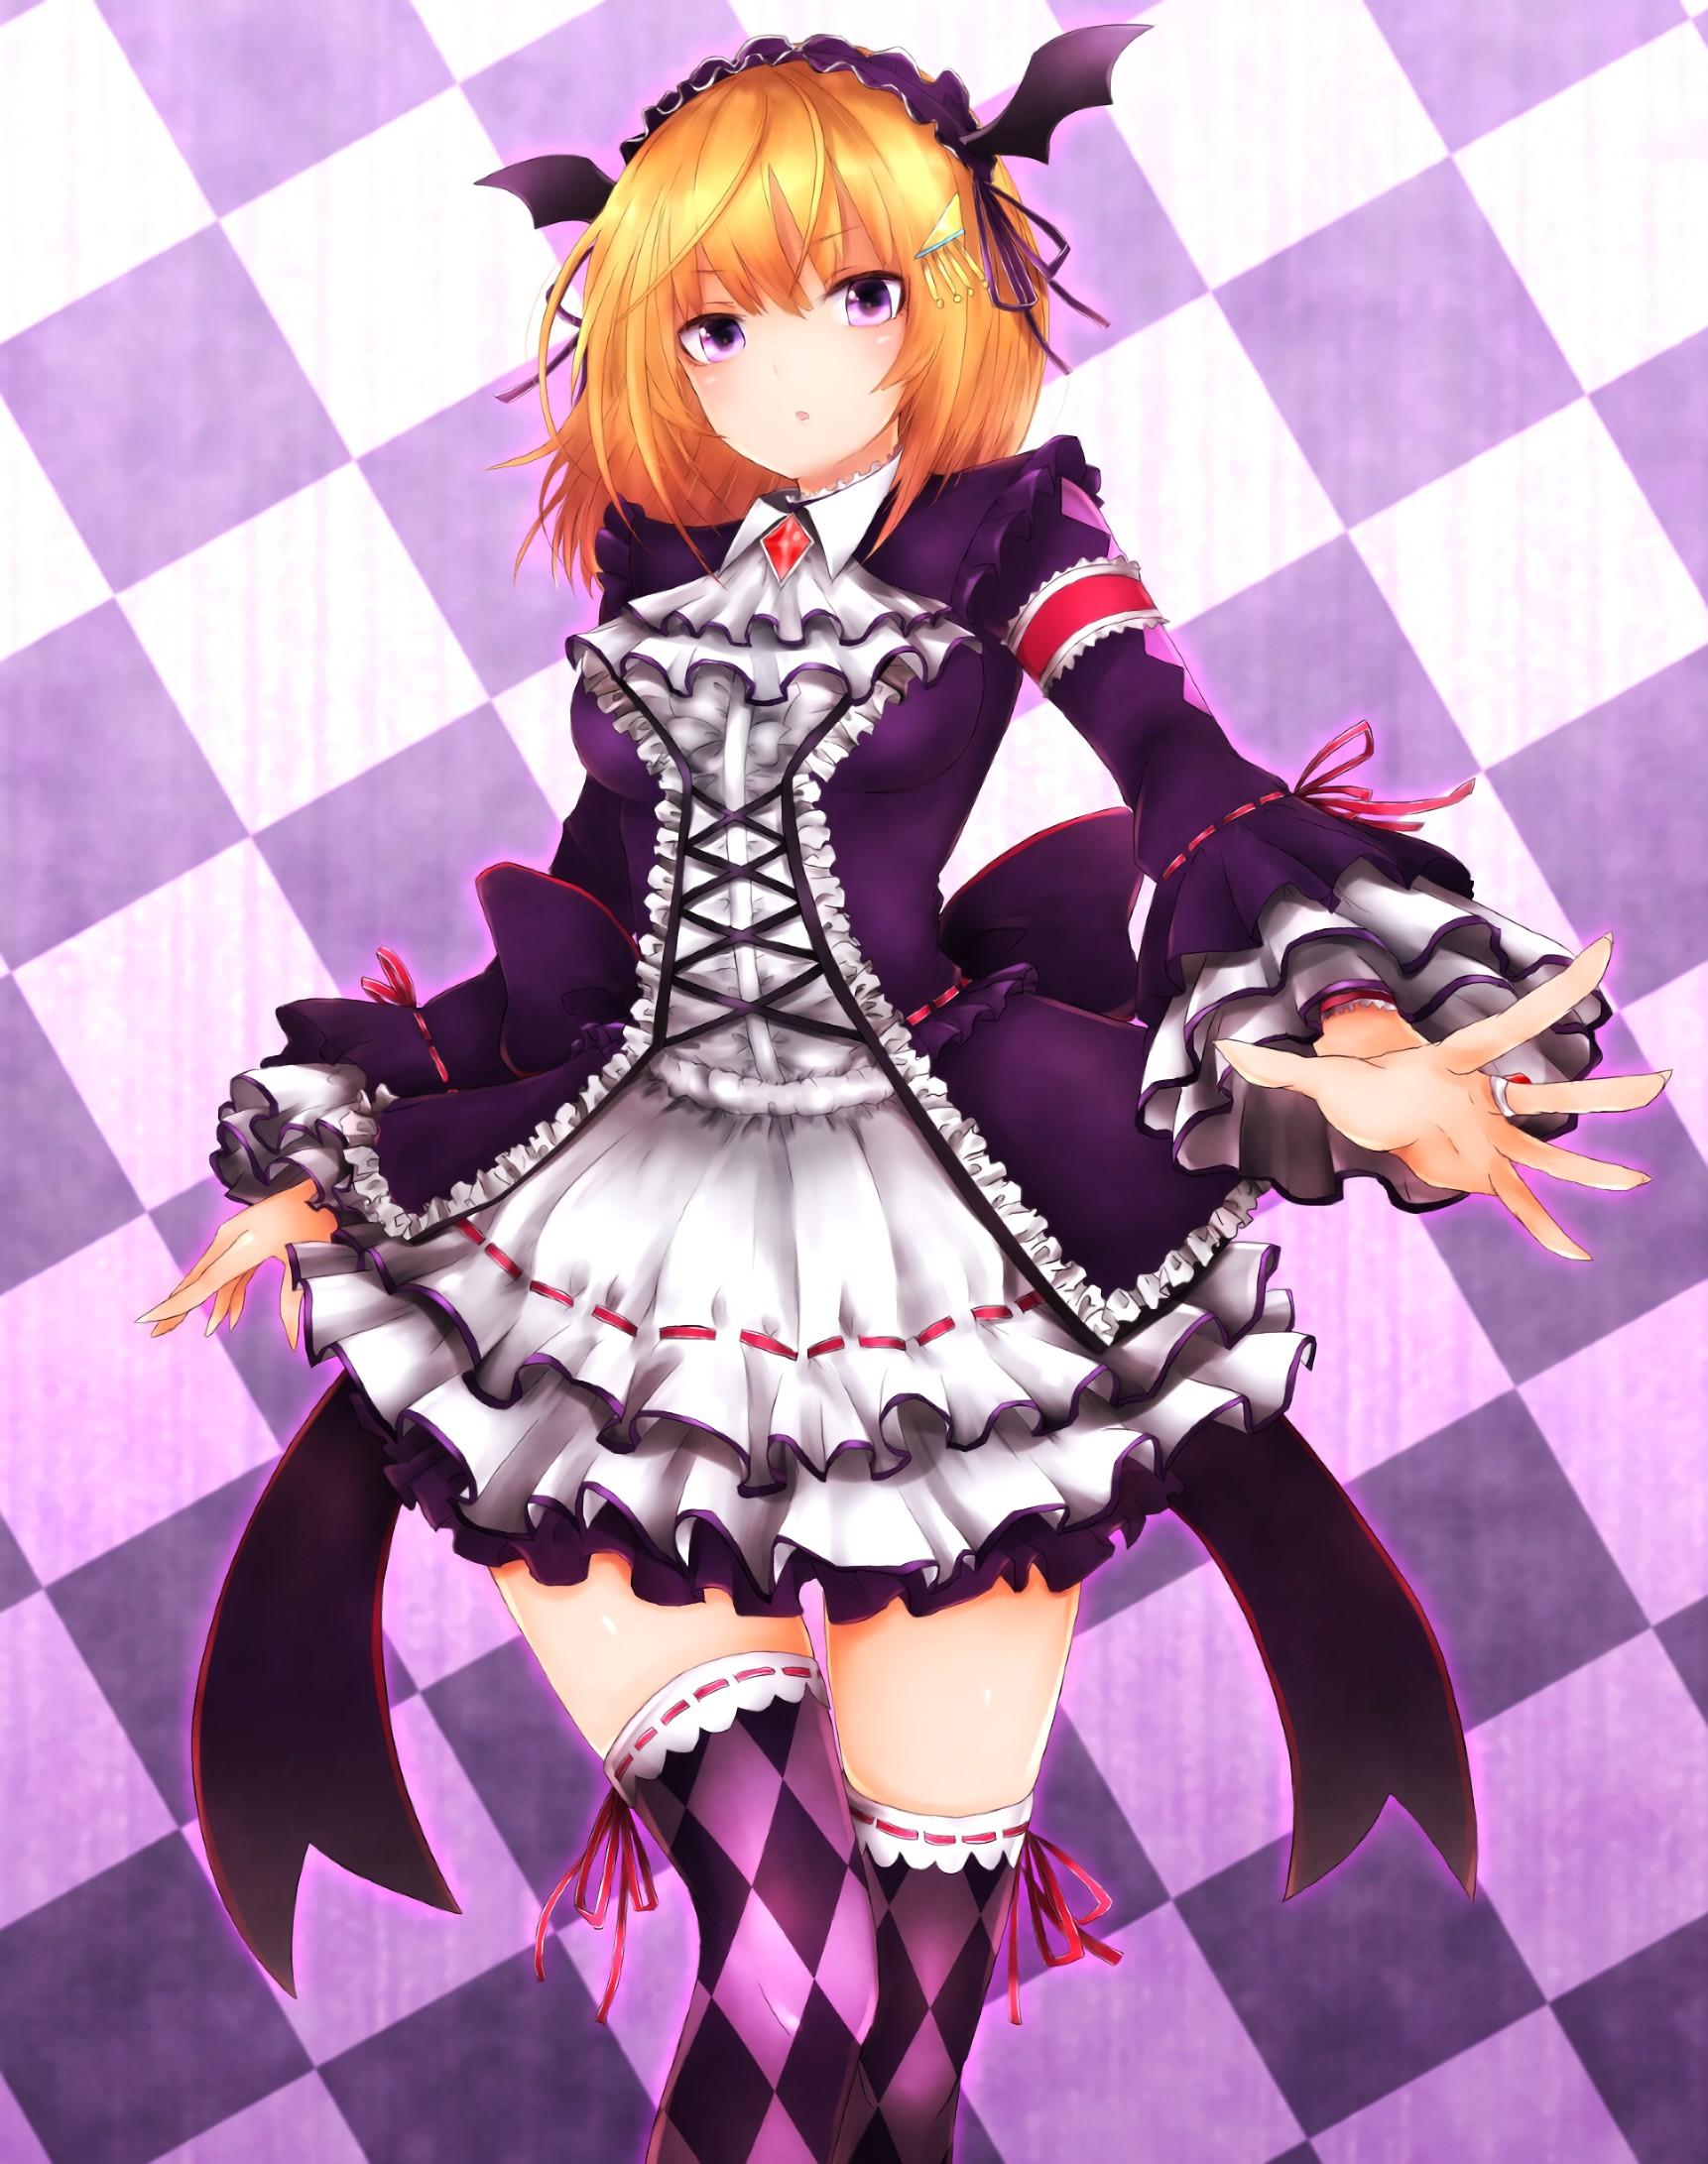 pink eyes, Anime, Anime girls, Phantasy Star Online 2